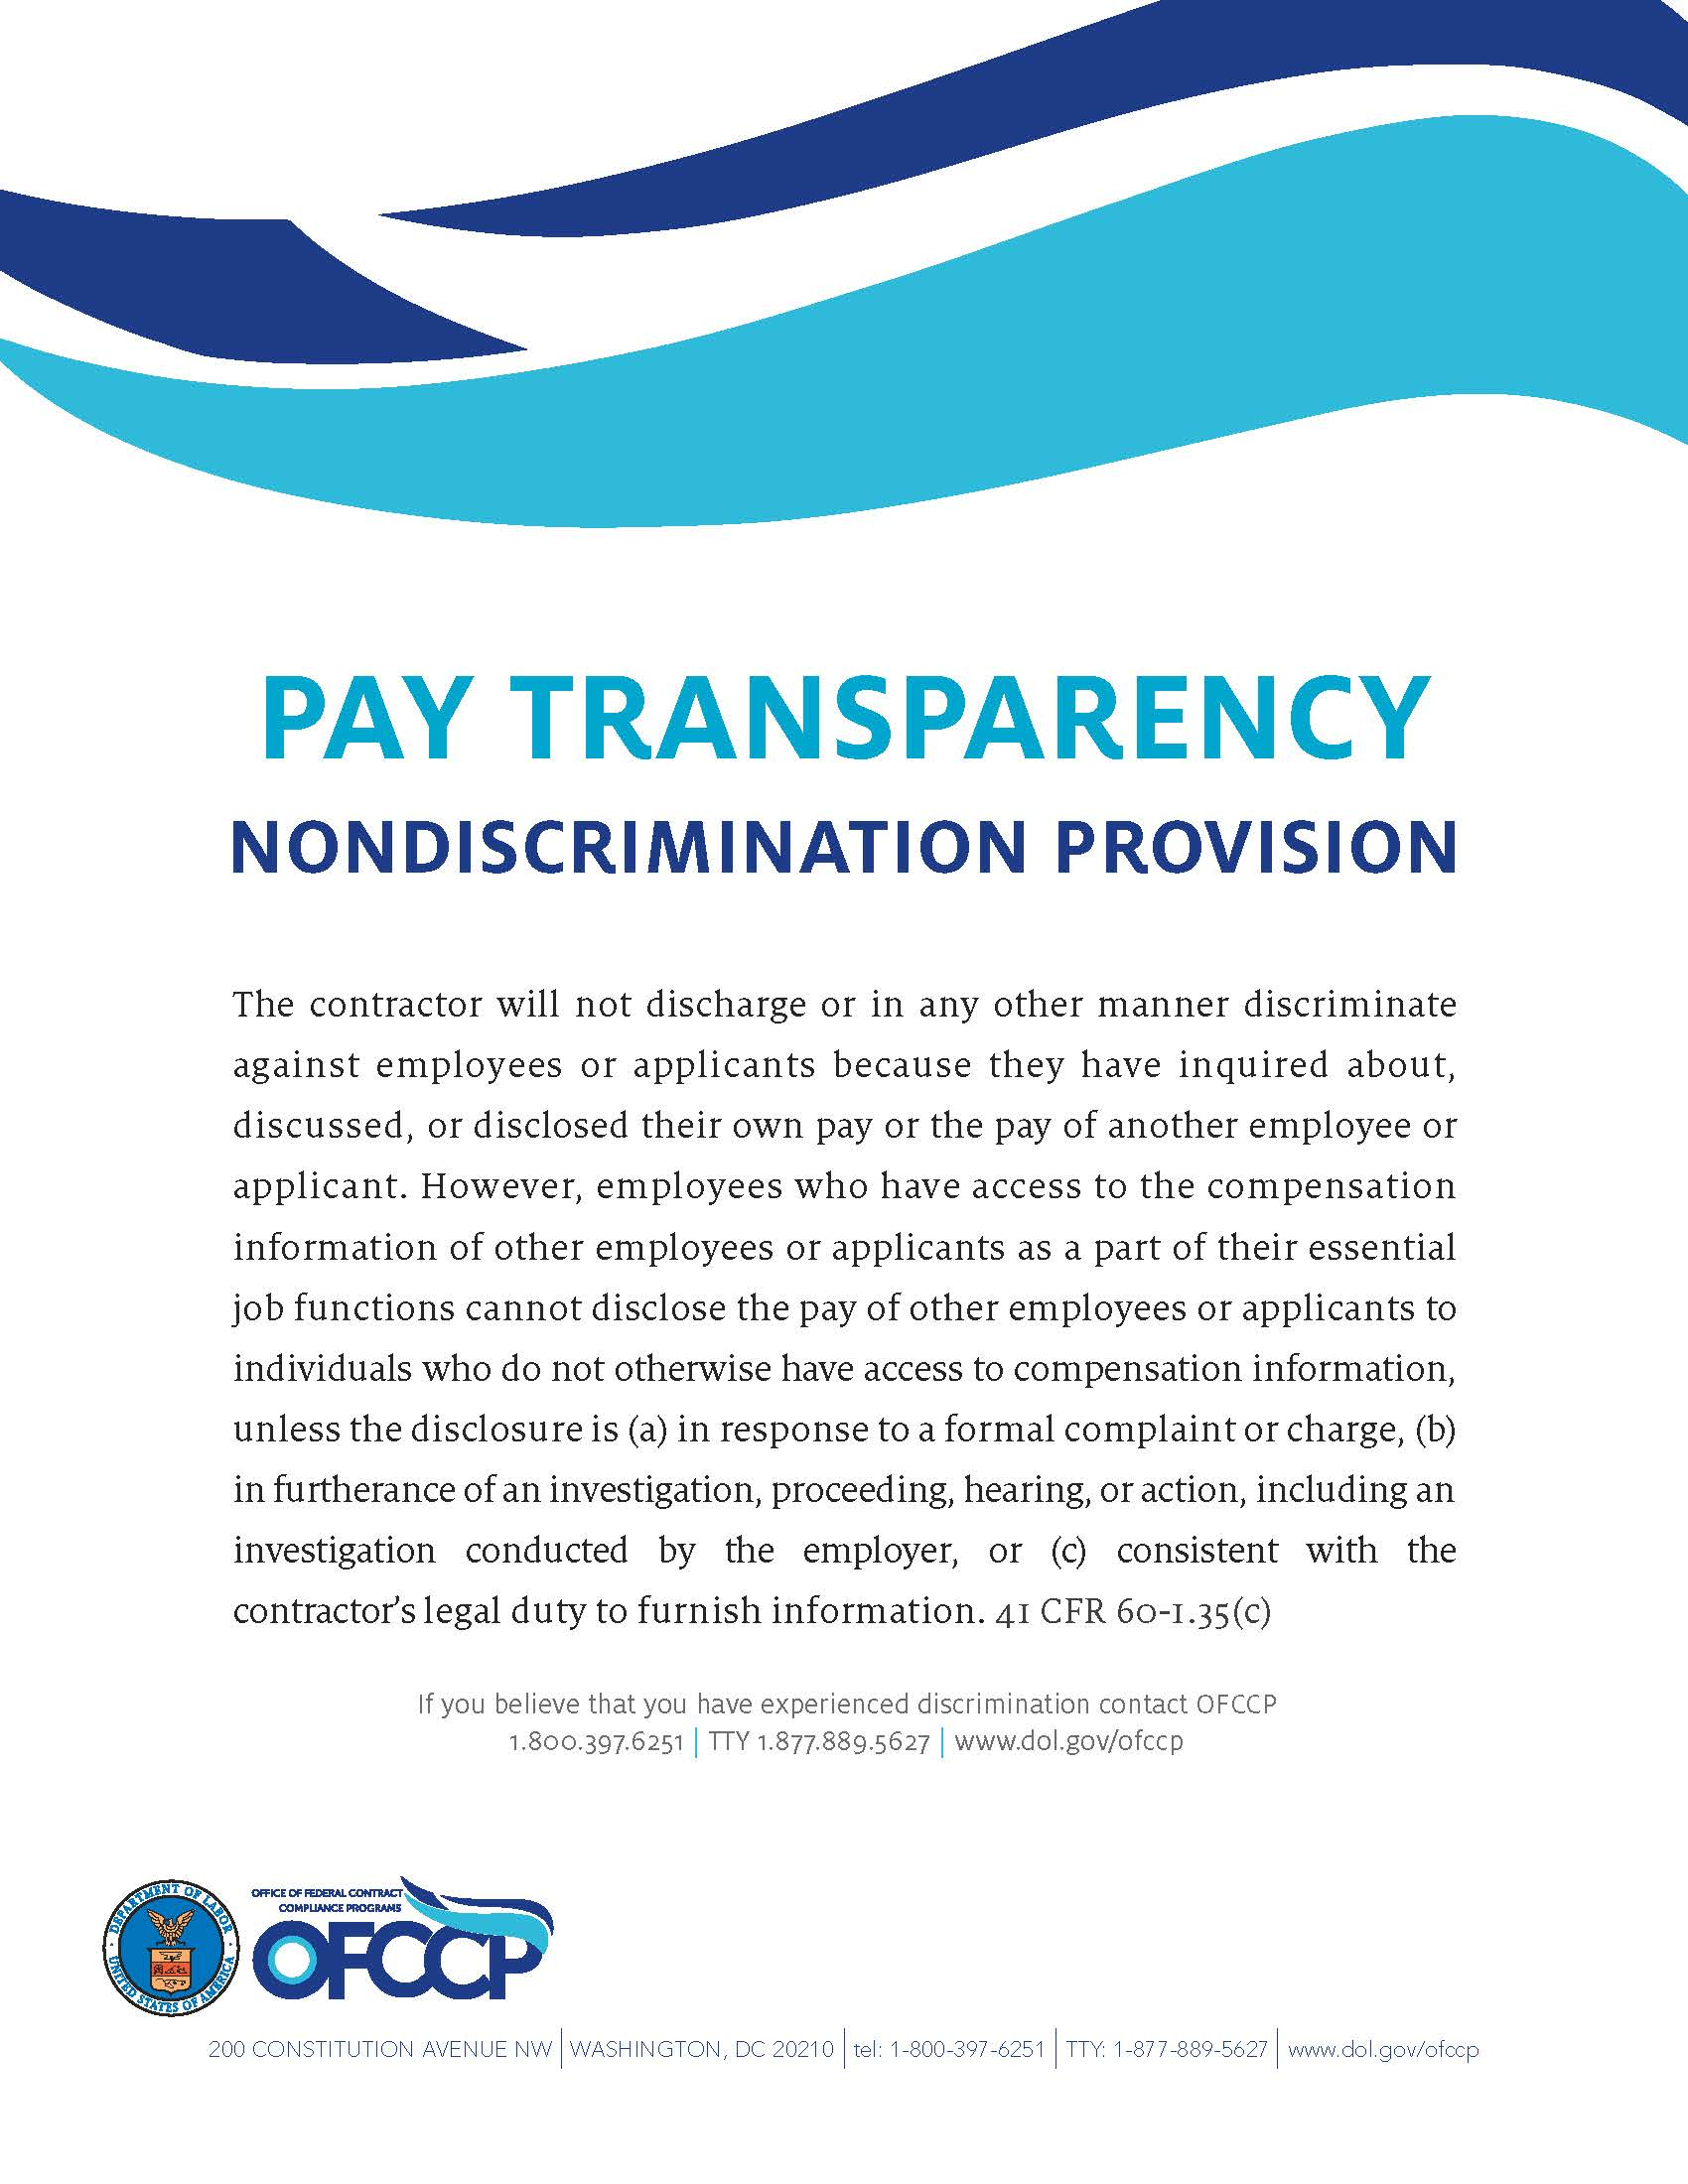 Nondiscrimination Provision